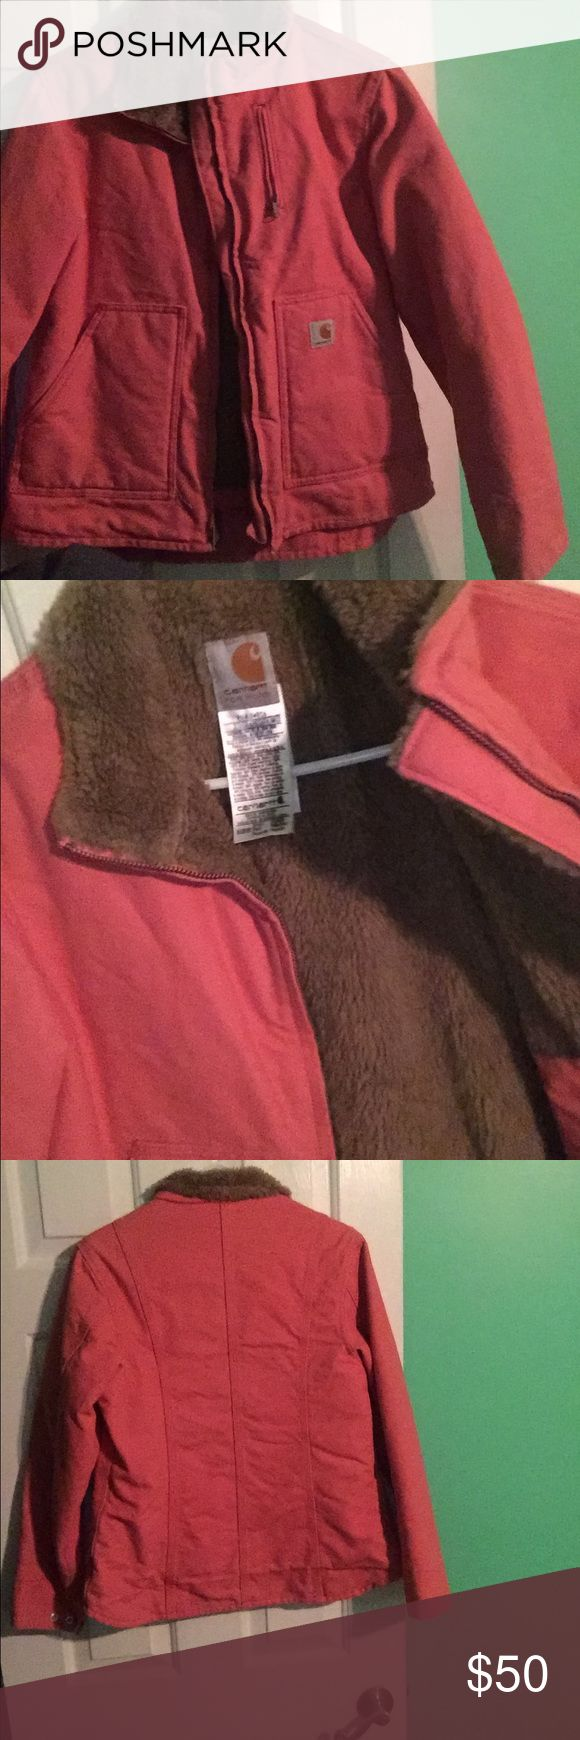 Pink carhartt jacket Like new maybe worn 4 times paid $85 Carhartt Jackets & Coats